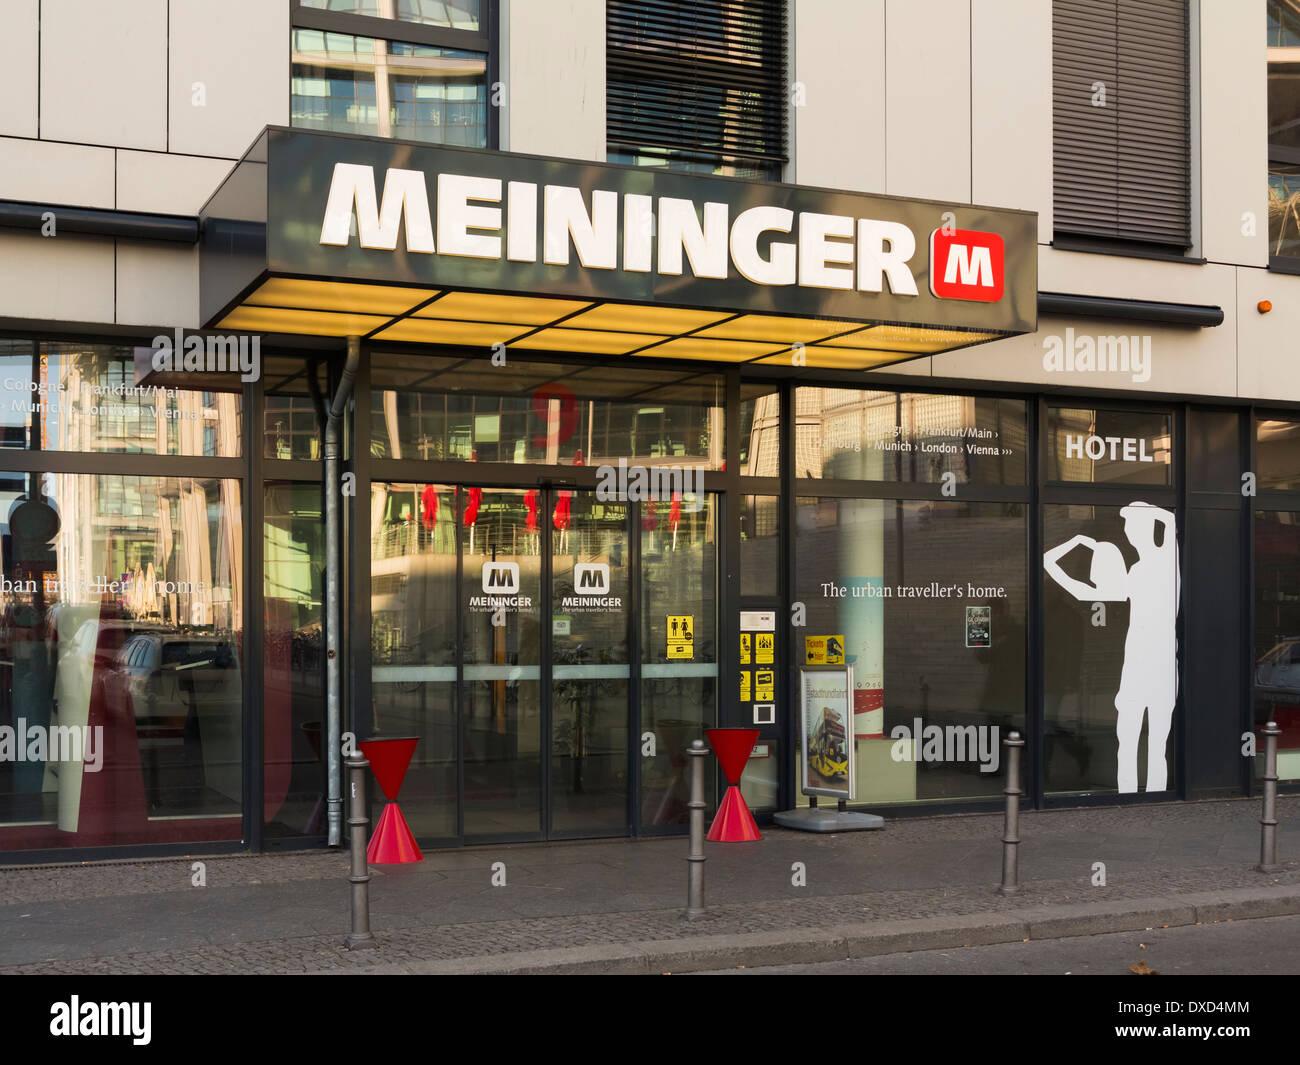 Meininger, Berlin, Germany, Europe - the famous hotel hostel - Stock Image